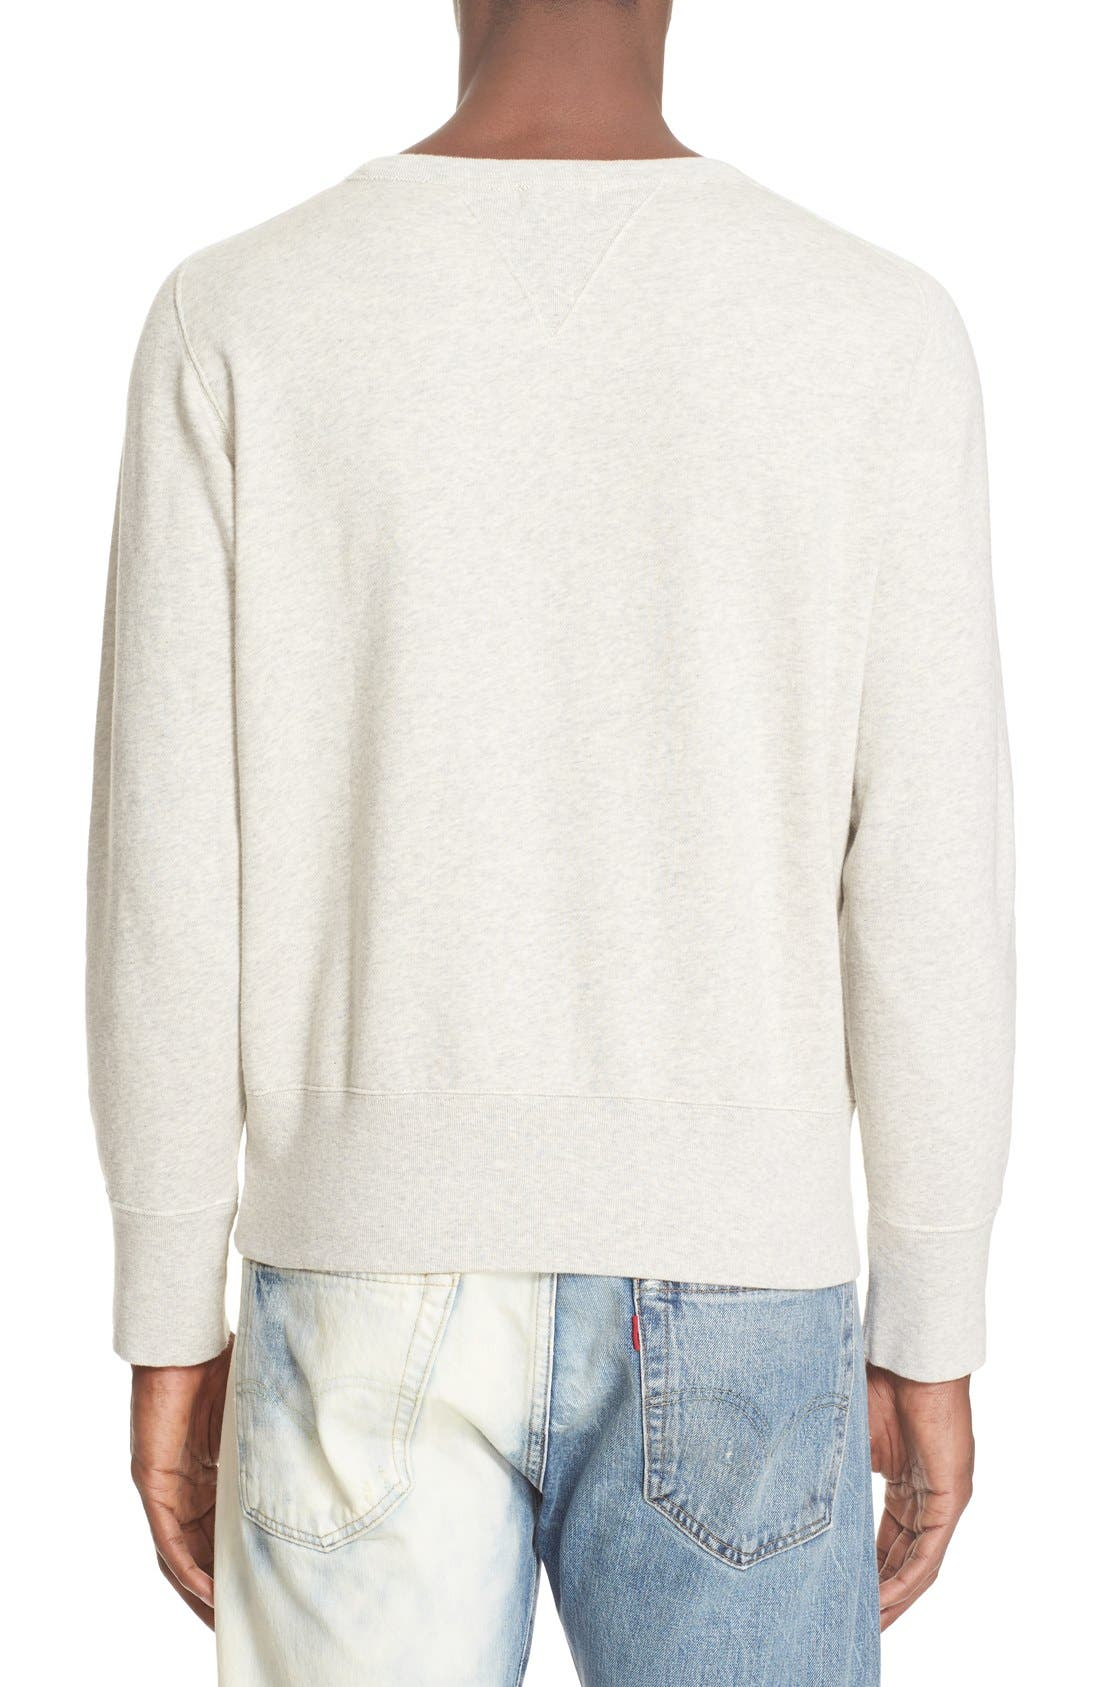 Bay Meadows Sweatshirt,                             Alternate thumbnail 2, color,                             White